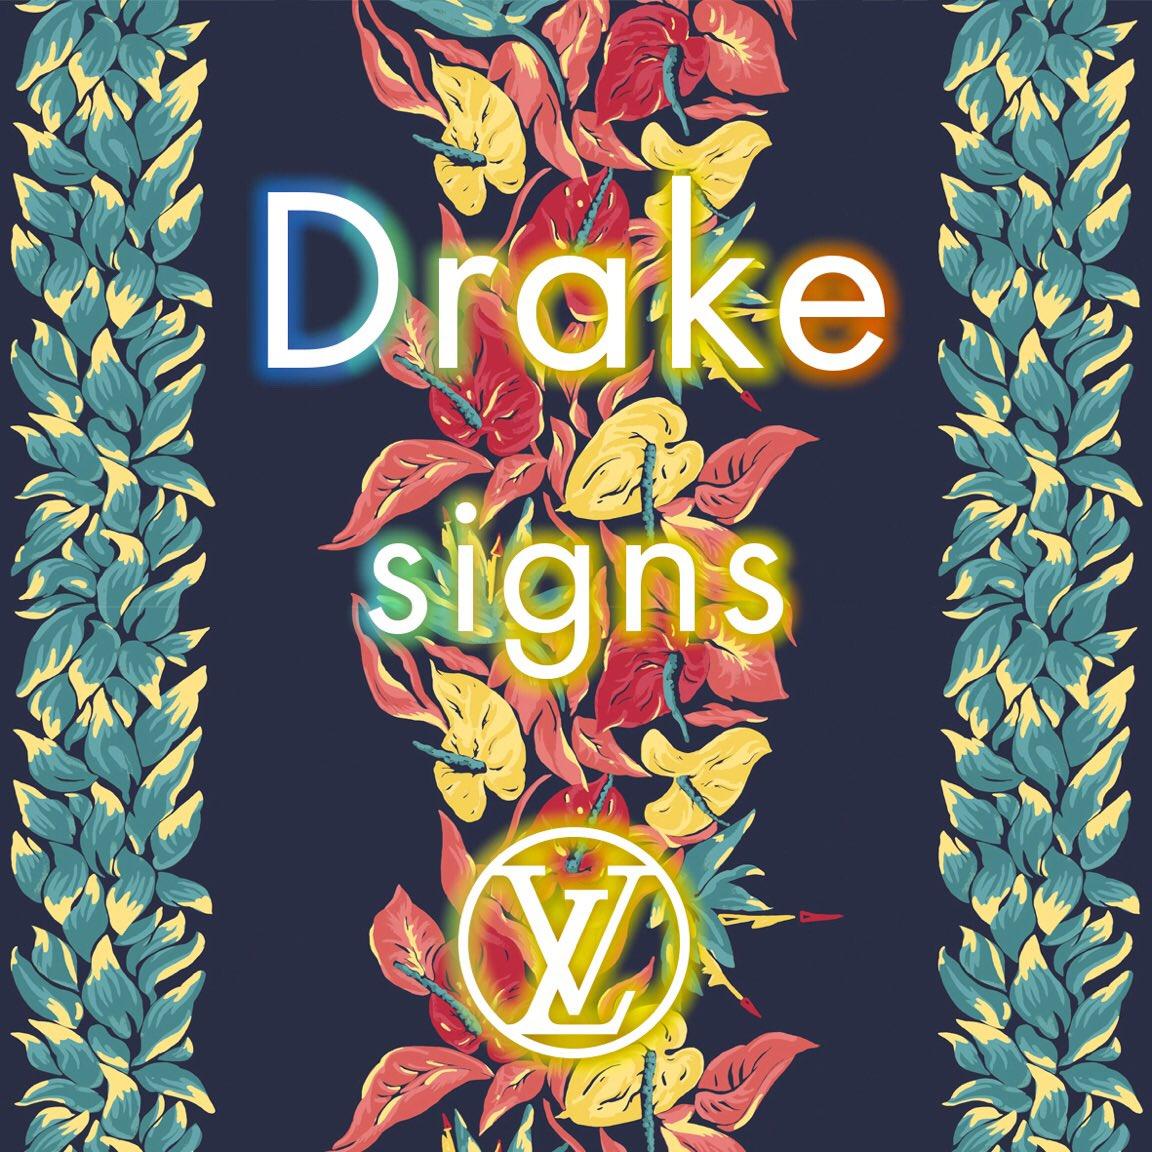 Drake 'signs' ovosound.io/signs